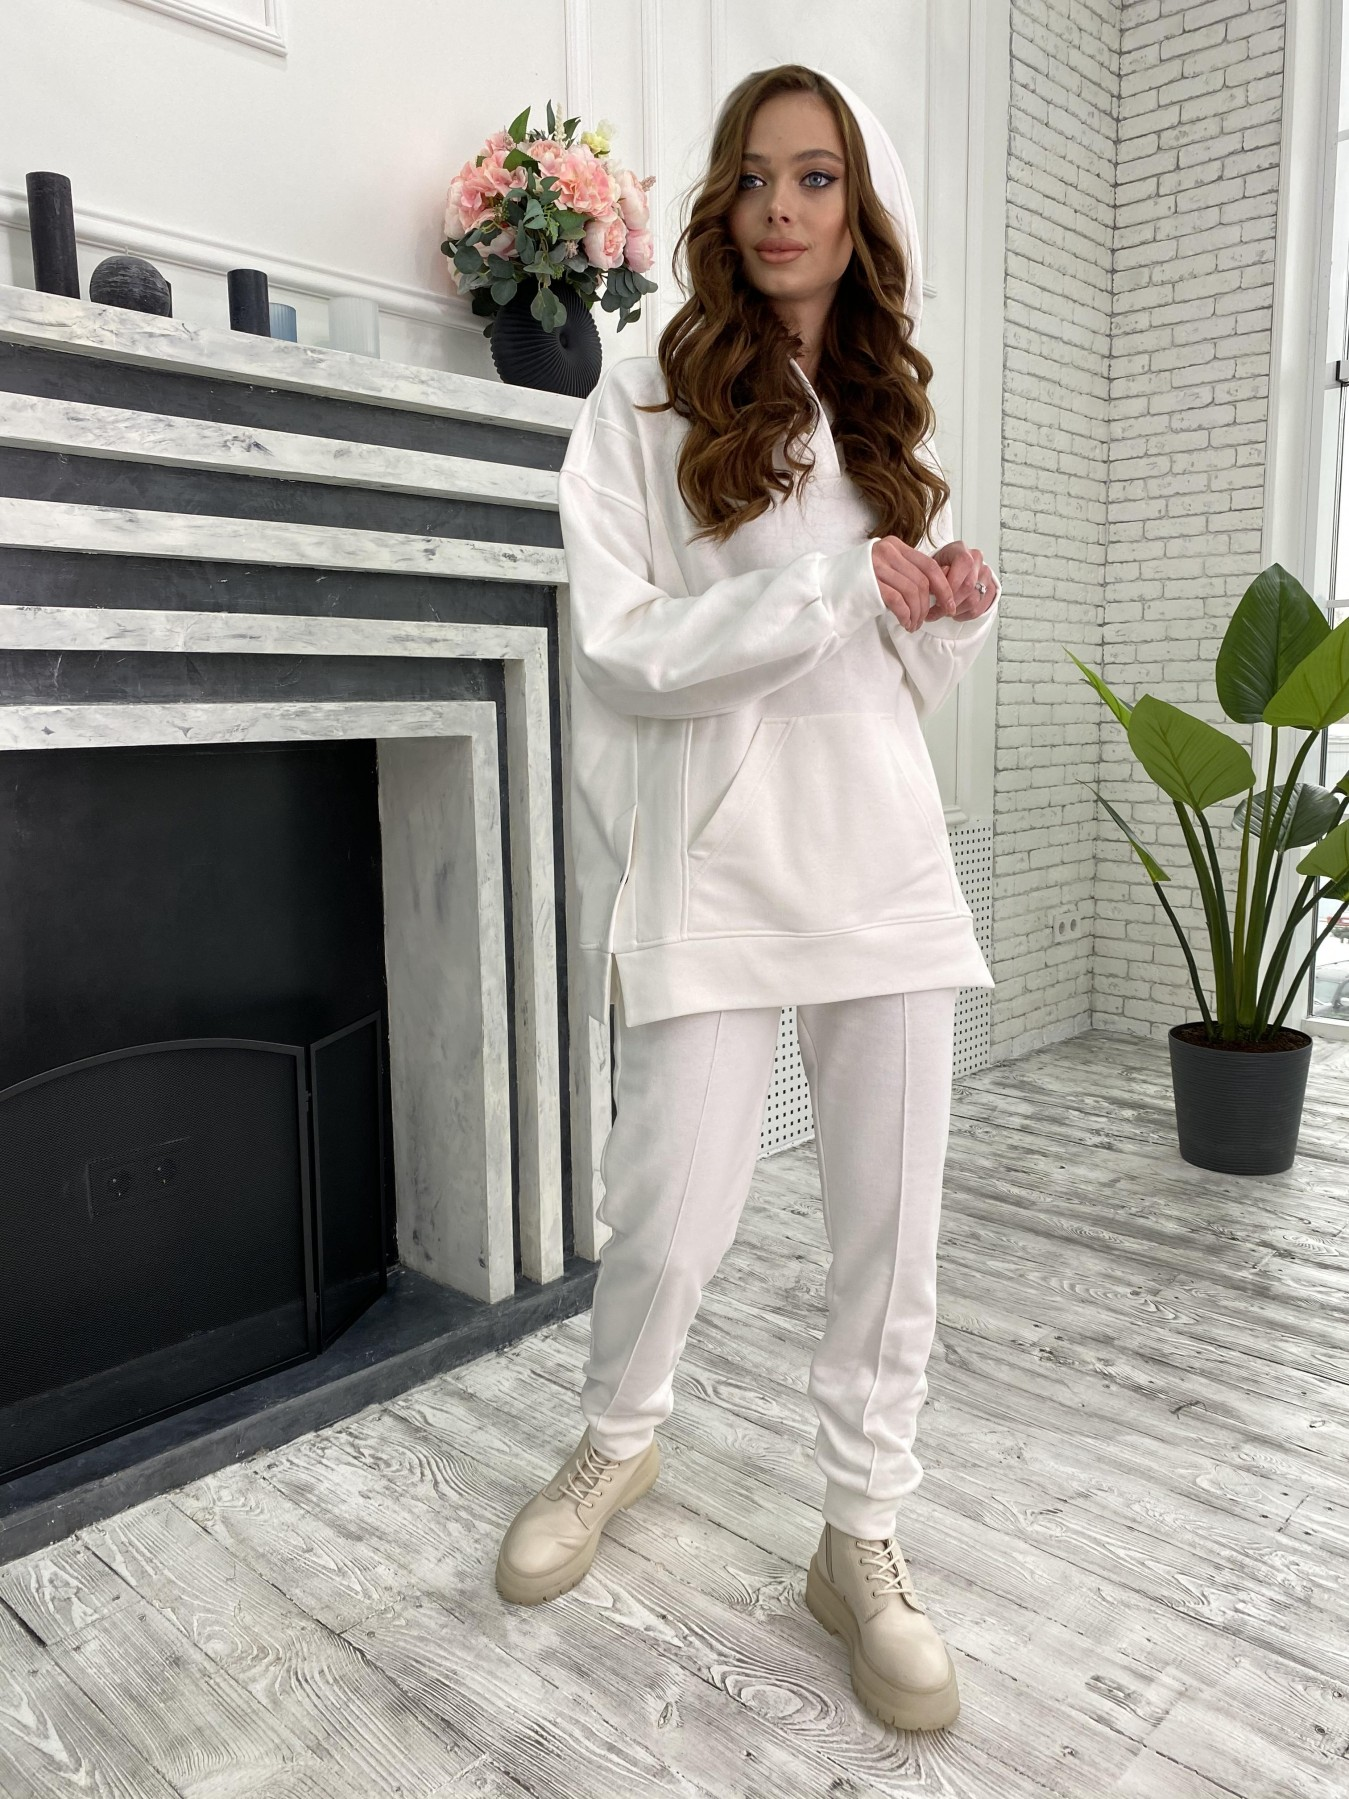 Лайф костюм  из 3х нитки 10782 АРТ. 47254 Цвет: Молоко - фото 3, интернет магазин tm-modus.ru